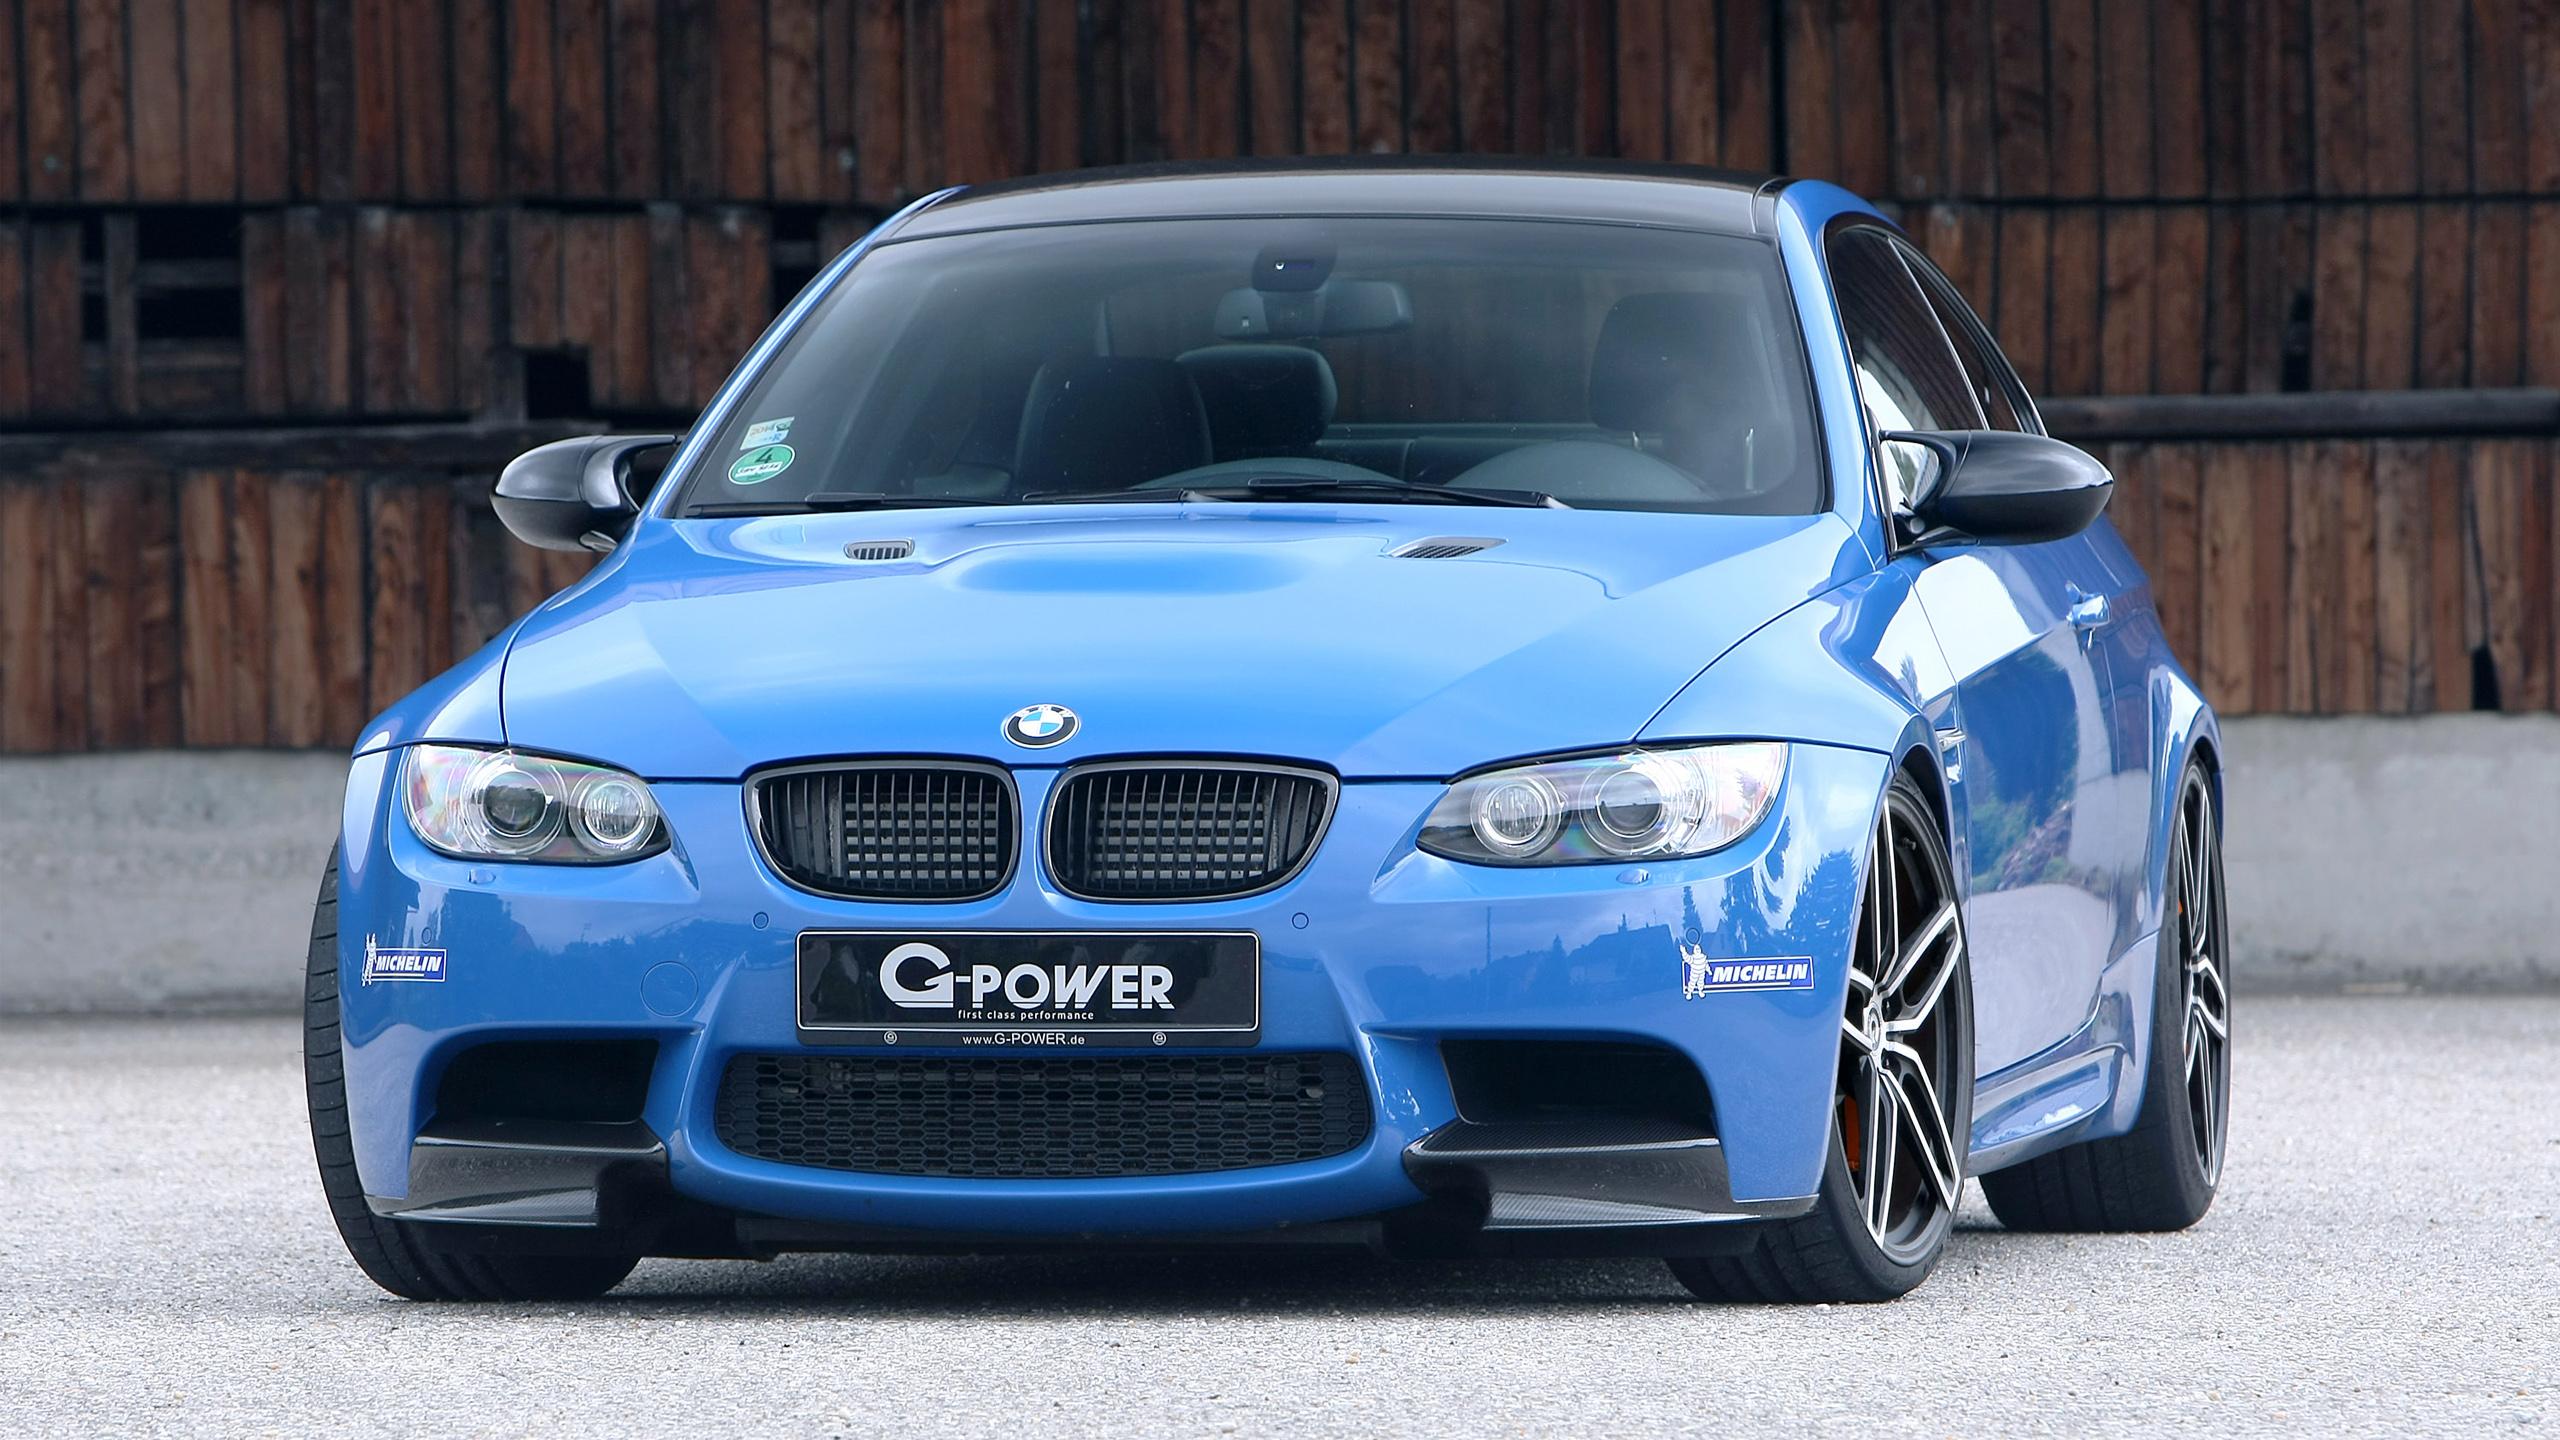 Mercedes G 900 >> 2015 G Power BMW M3 Wallpaper | HD Car Wallpapers | ID #5149